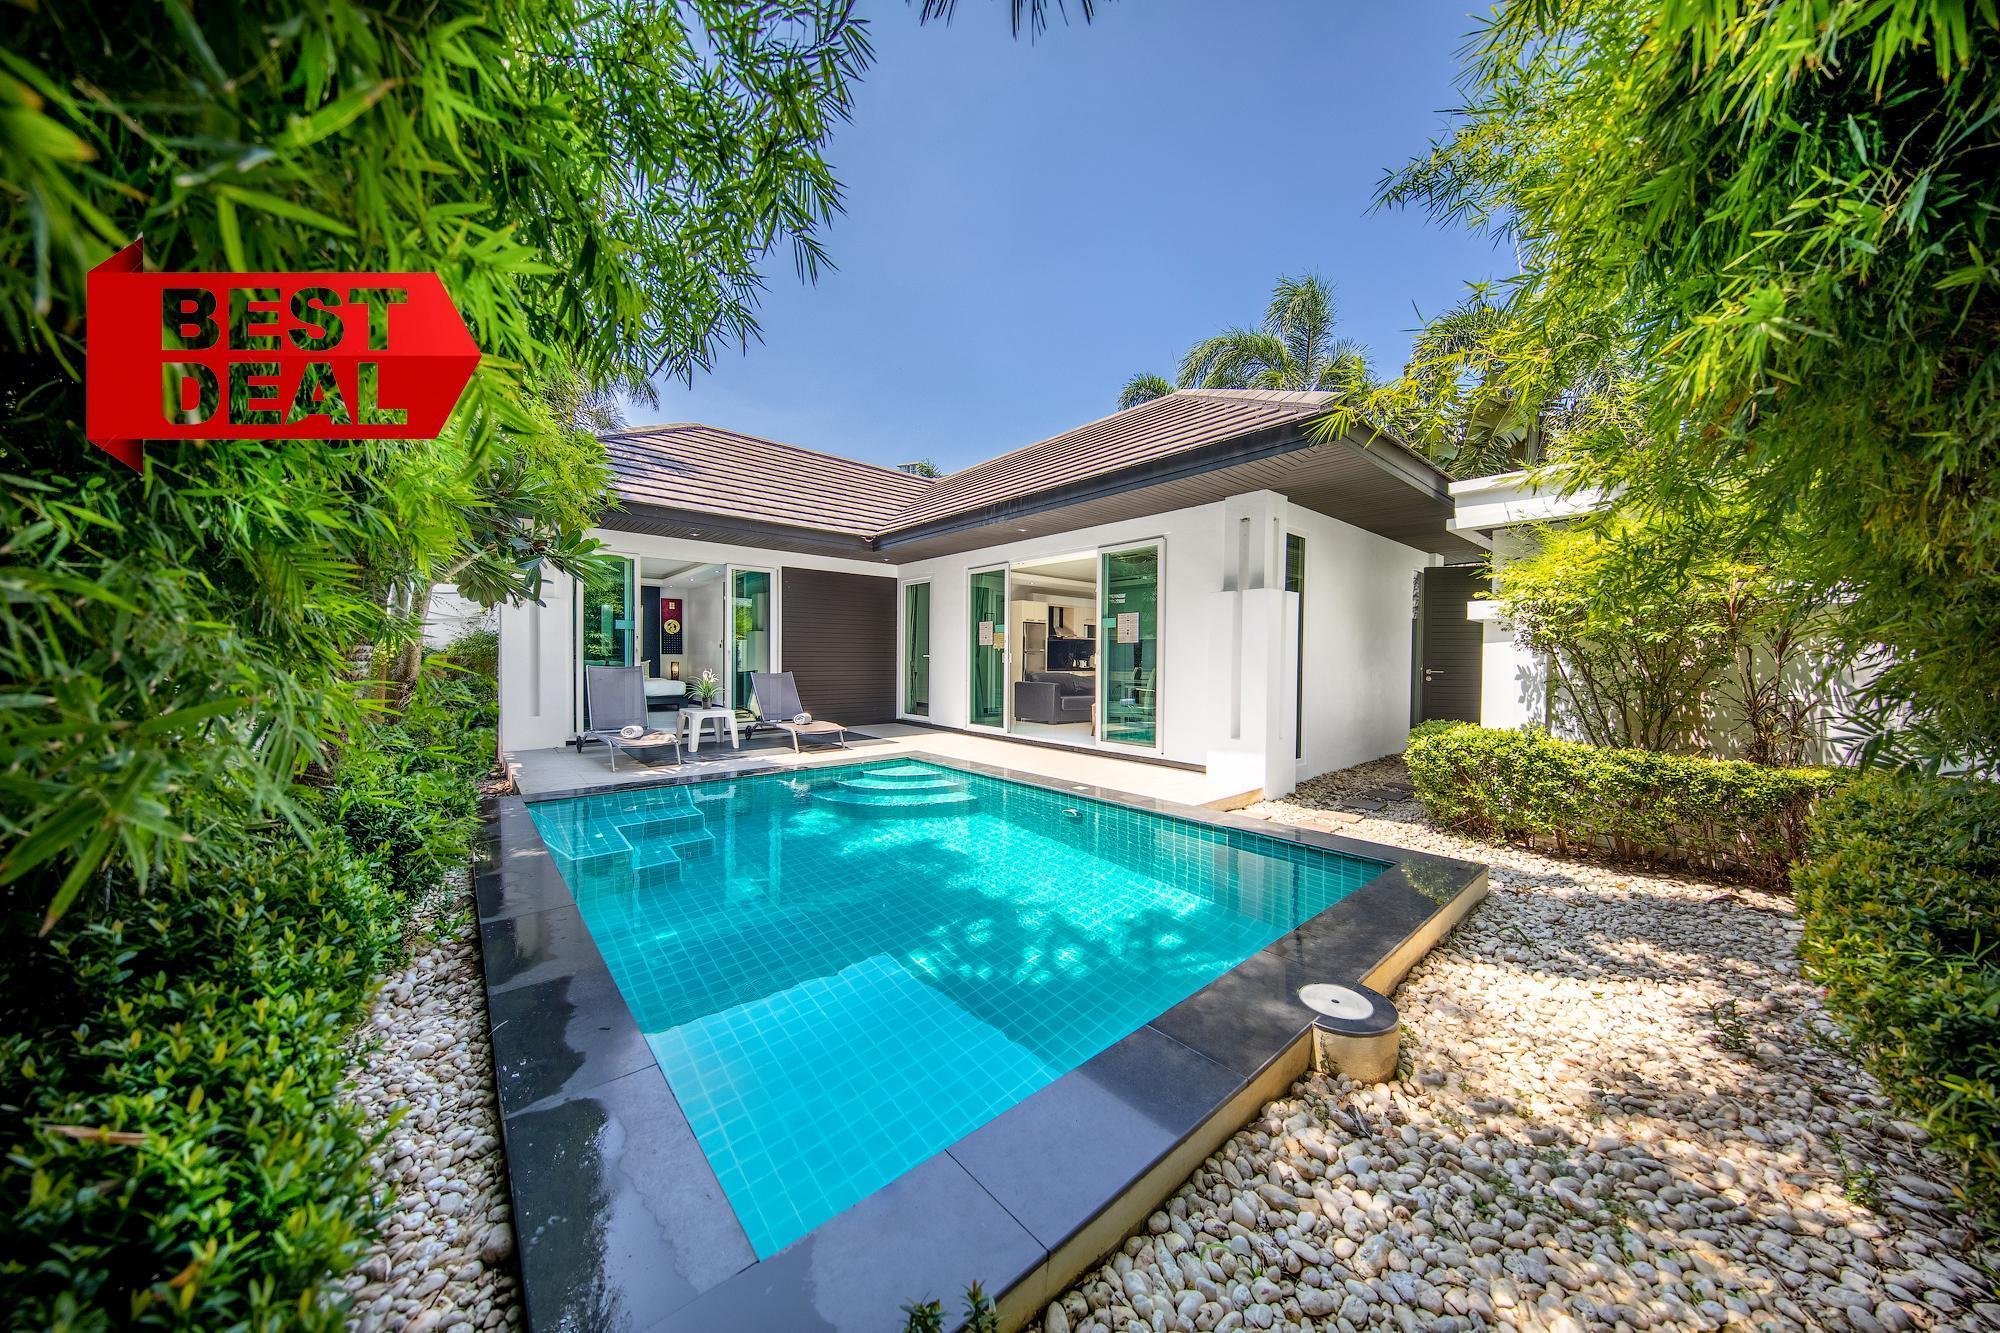 BEST SELLER Deluxe 2 BR Villa Palm Oasis Village วิลลา 2 ห้องนอน 2 ห้องน้ำส่วนตัว ขนาด 170 ตร.ม. – หาดจอมเทียน